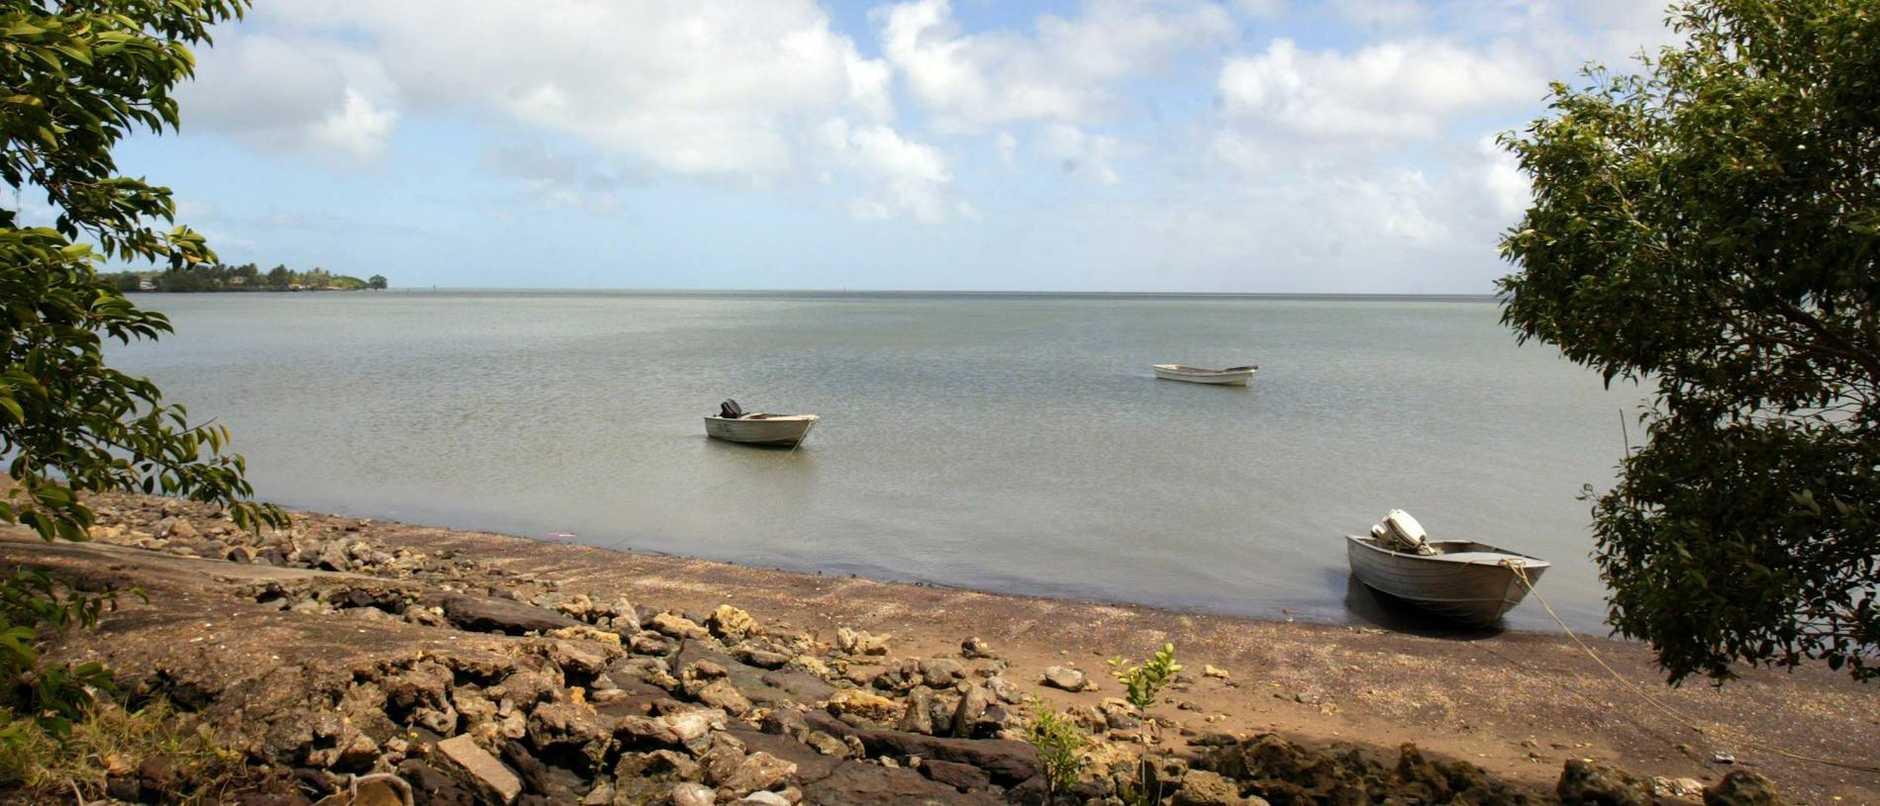 Torres Strait. Saibai Island.